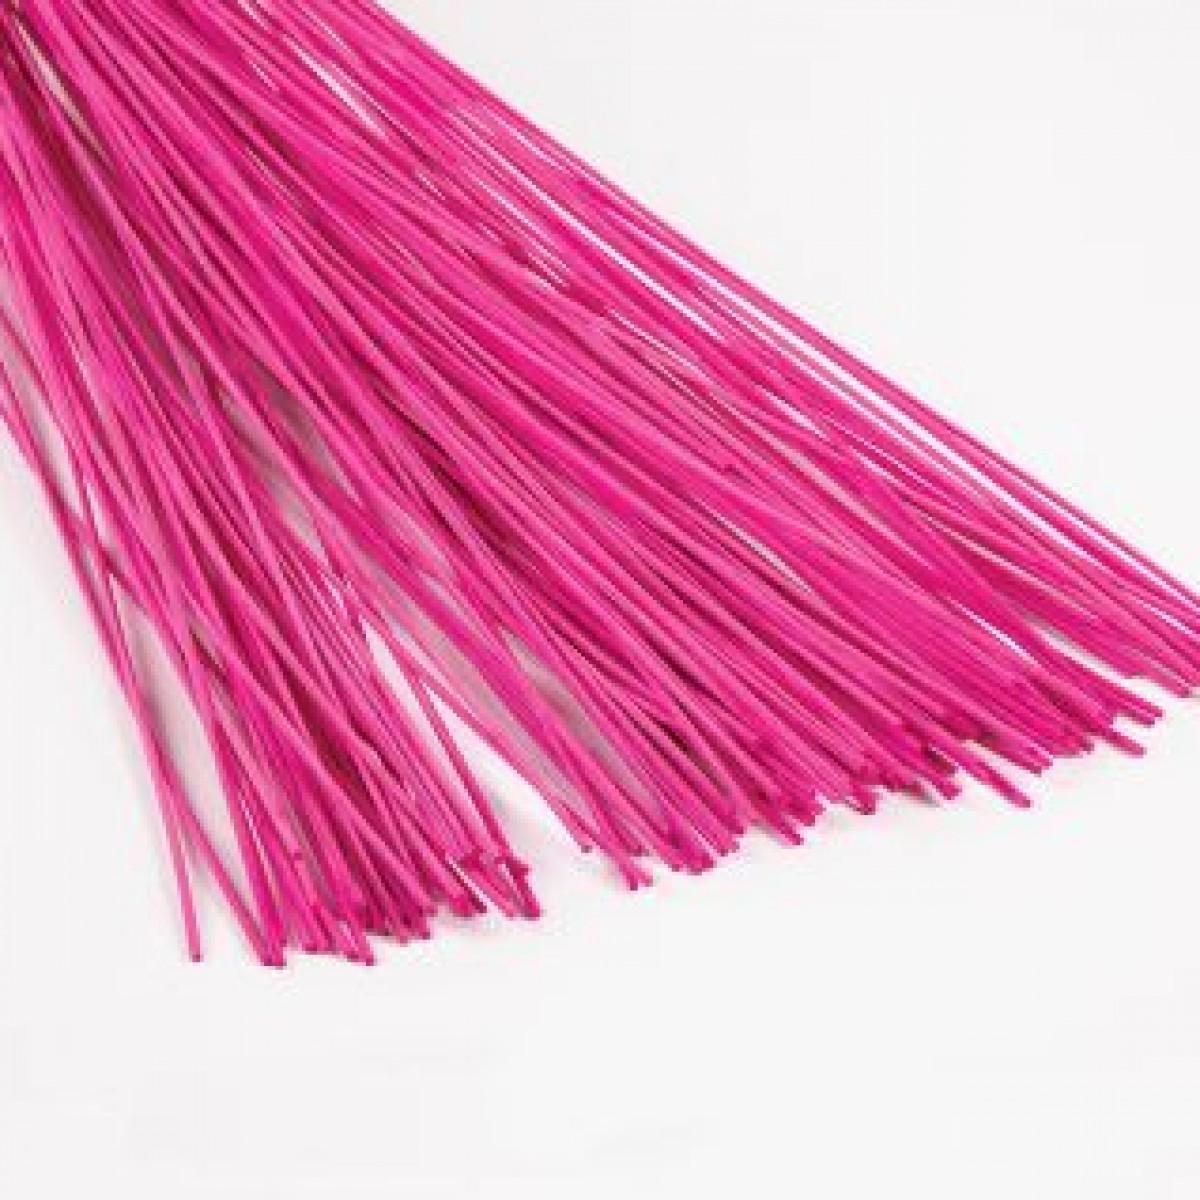 4458 Midelino Stick Strong Pink (120-150 Sticks)